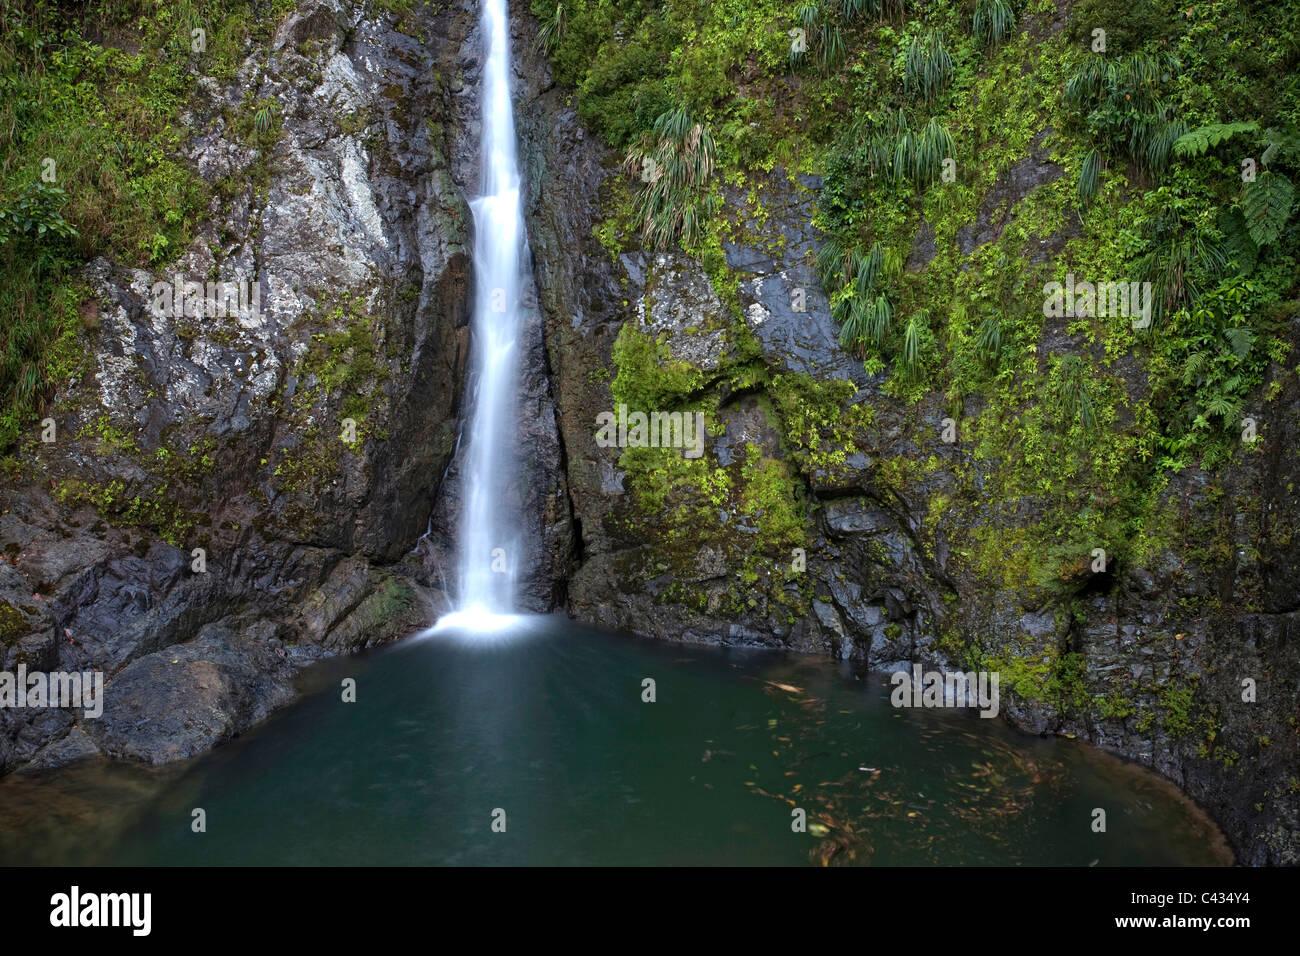 Usa, Caribbean, Puerto Rico, Central Mountains, Toro Negro Forest, Dona Juana Waterfall - Stock Image